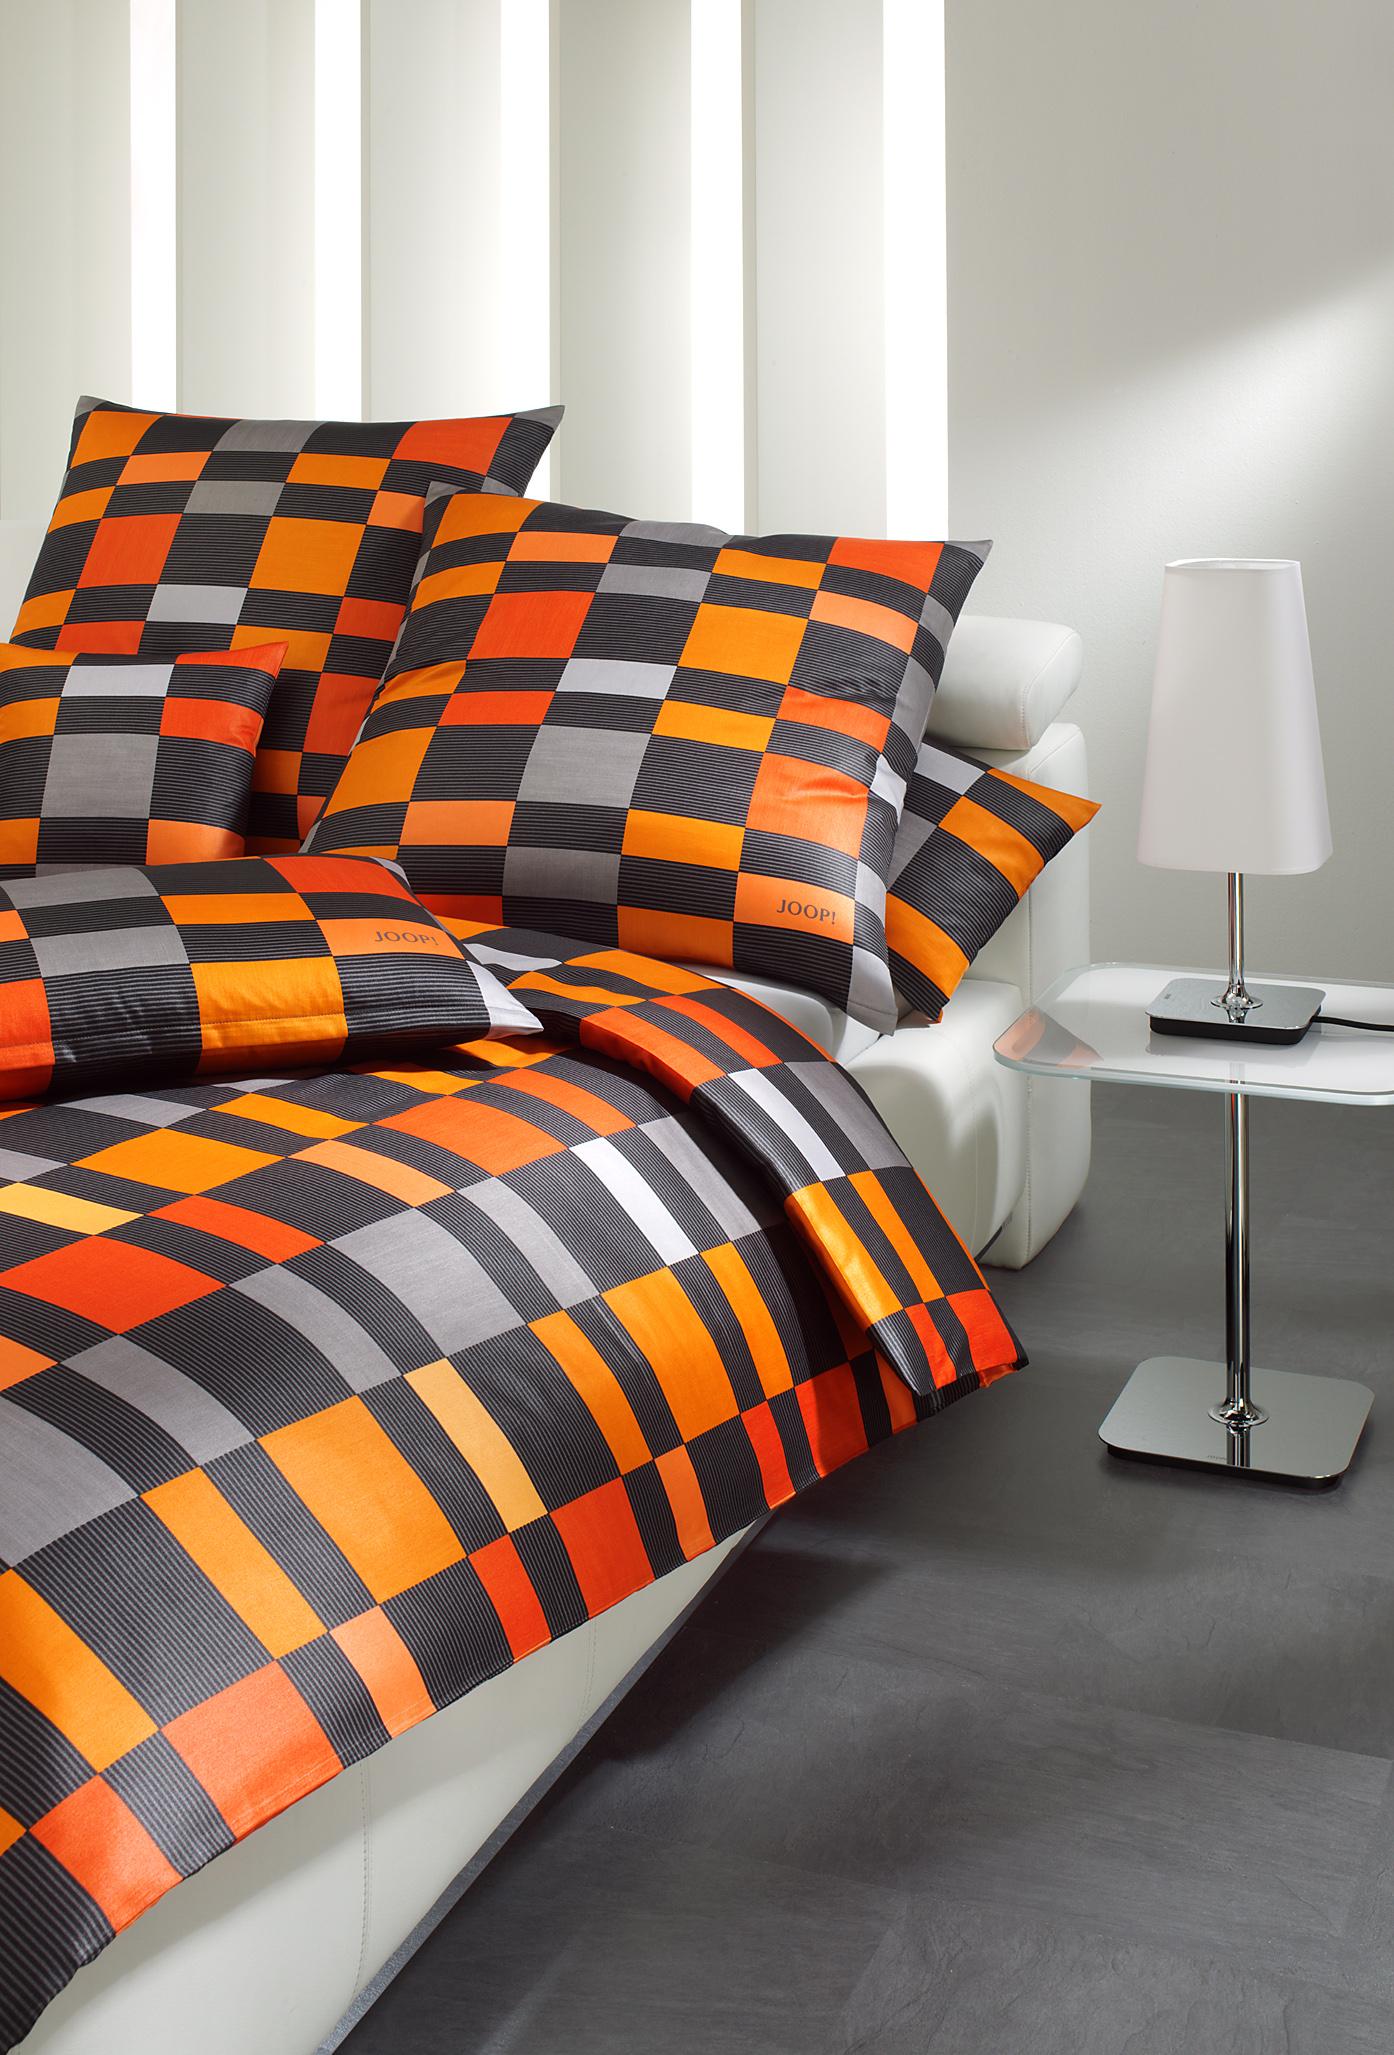 joop bettw sche lucern squares orange 4044 8 in 2 gr en preiswert bestellen. Black Bedroom Furniture Sets. Home Design Ideas